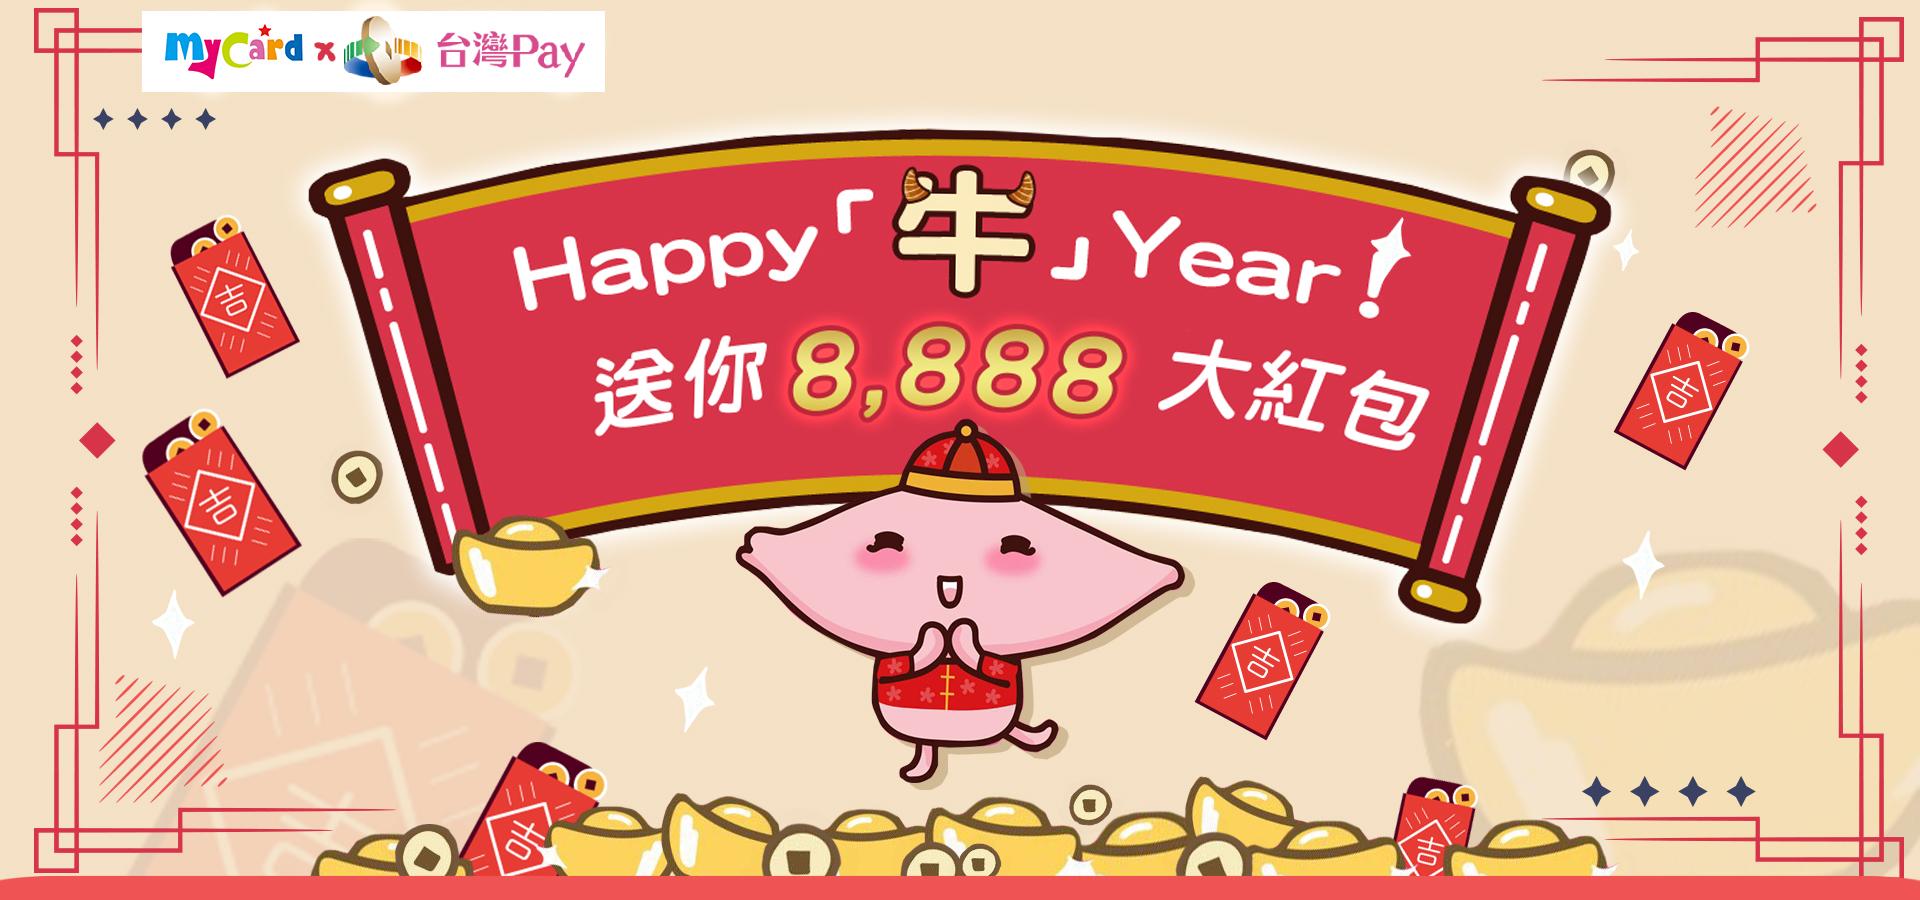 Happy「牛」Year!台灣Pay買MyCard 送8888大紅包